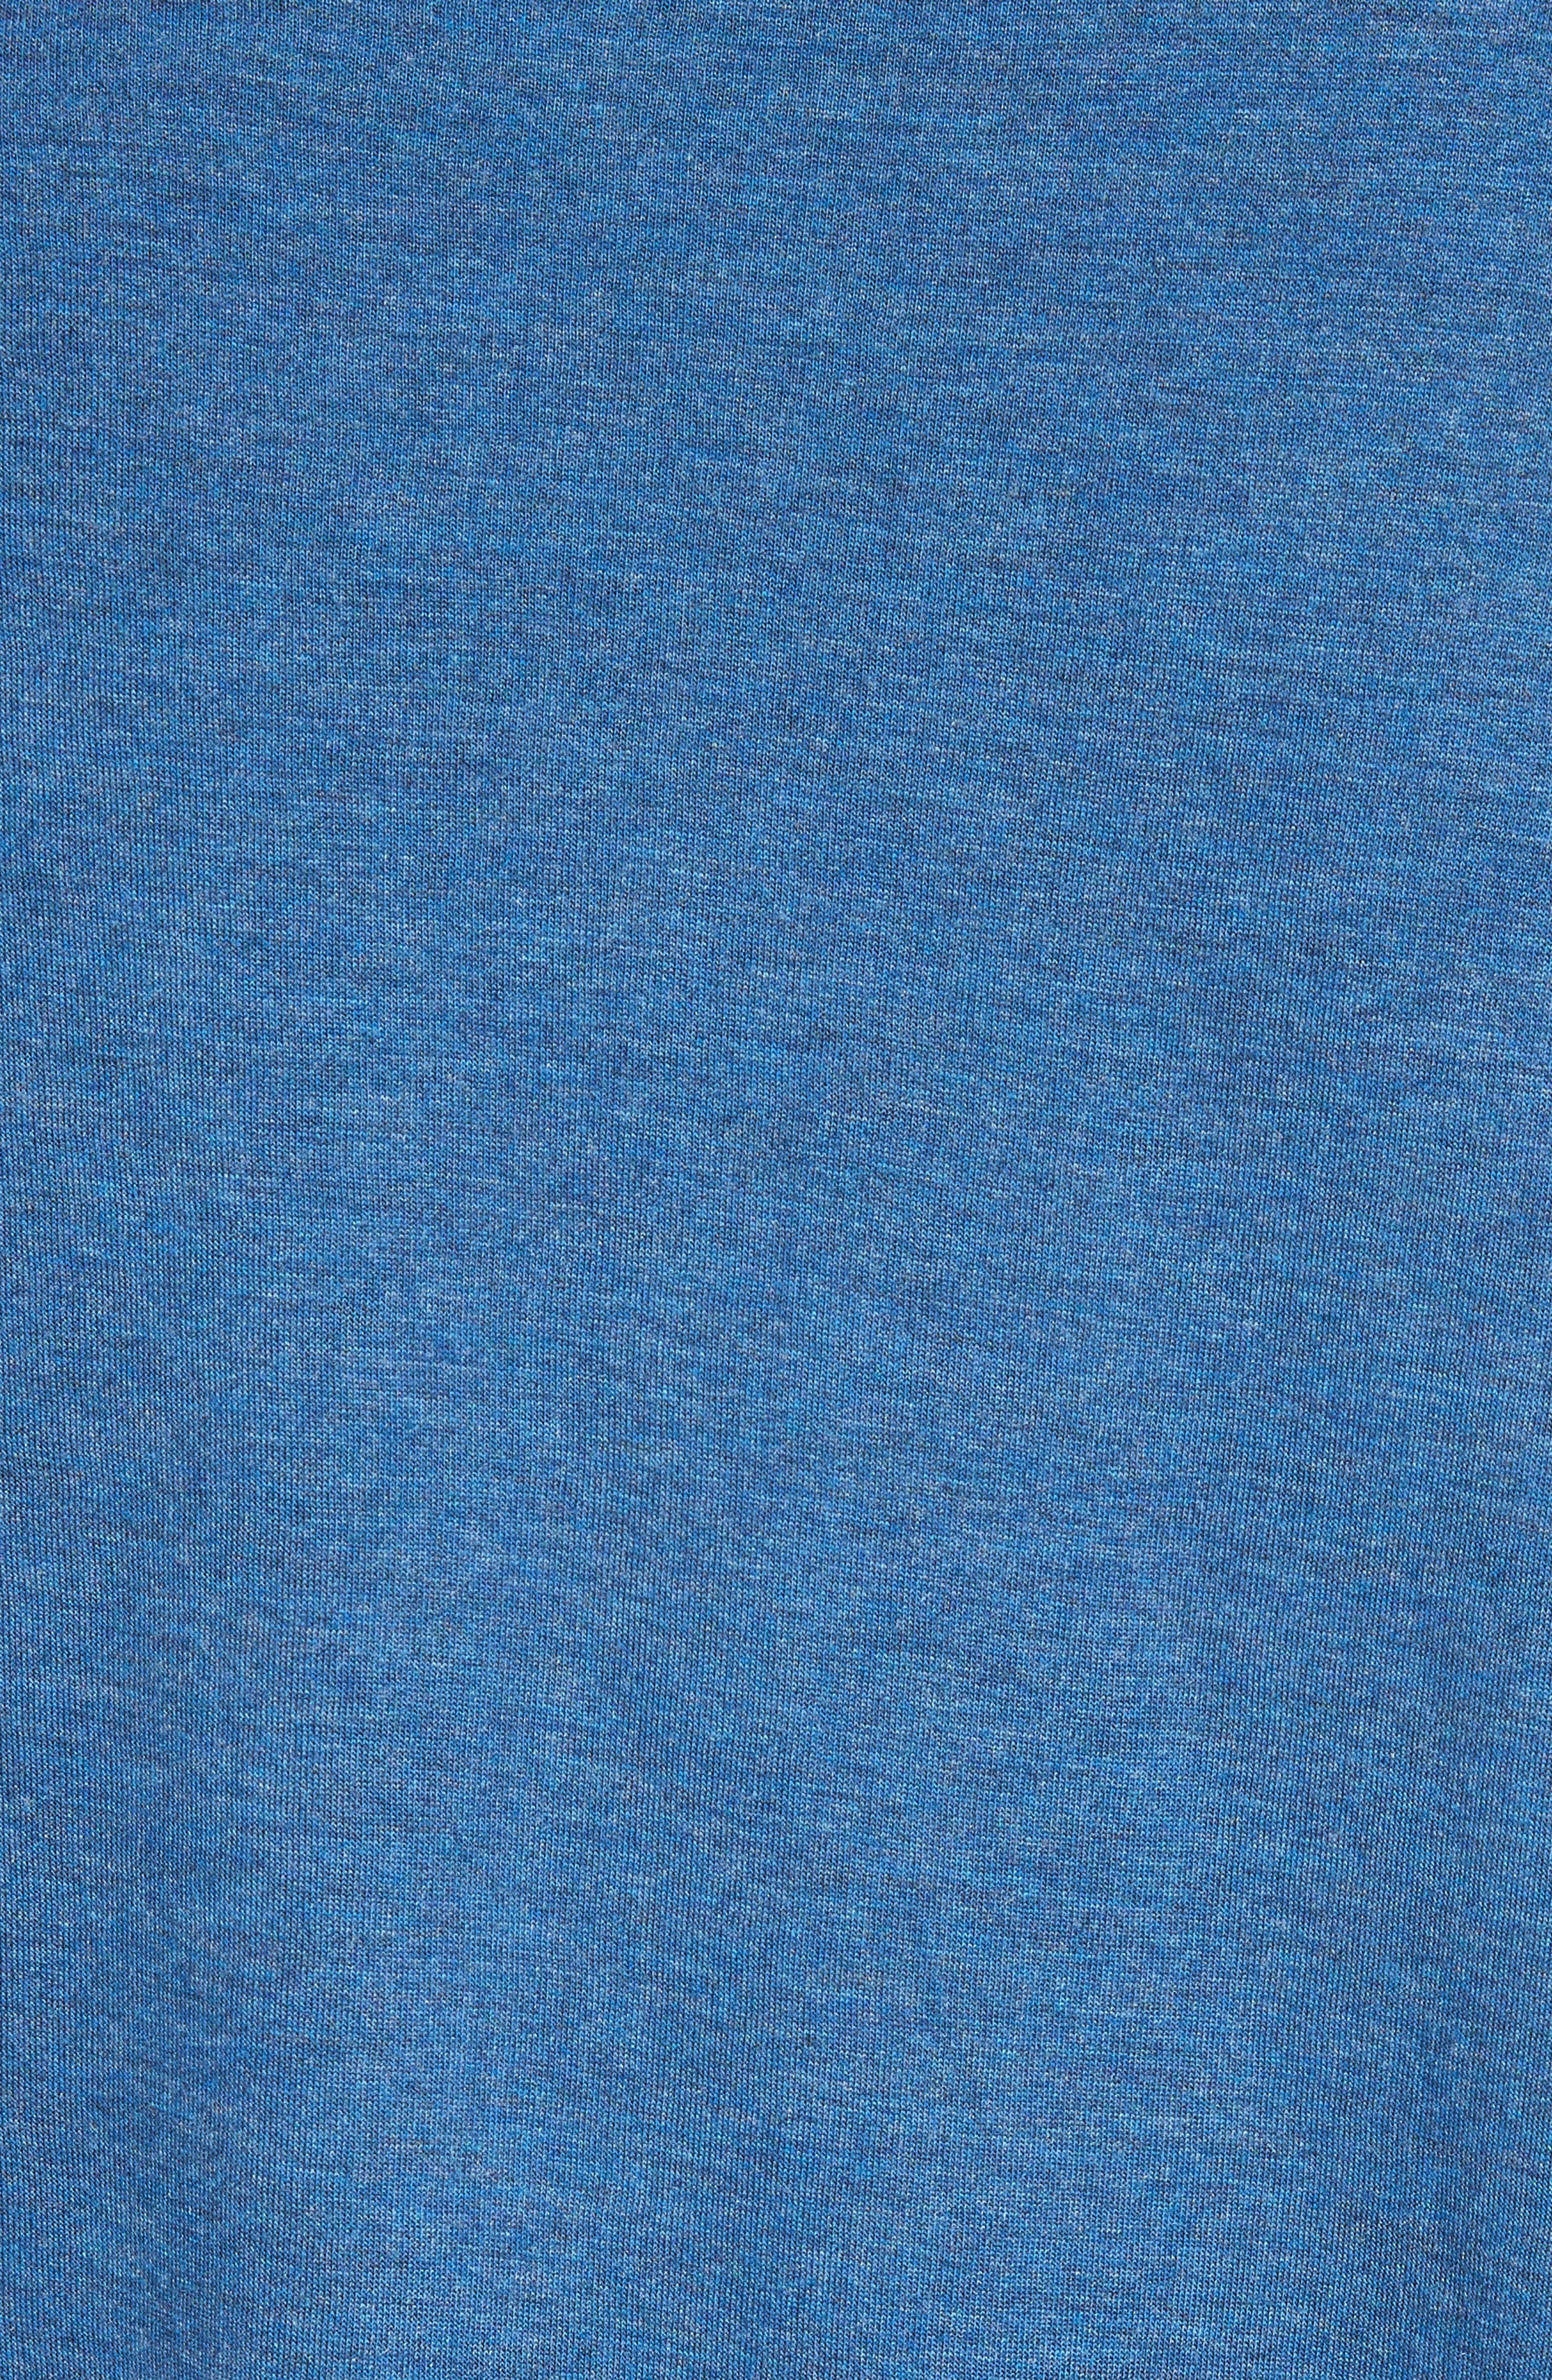 Overlap T-Shirt Dress,                             Alternate thumbnail 5, color,